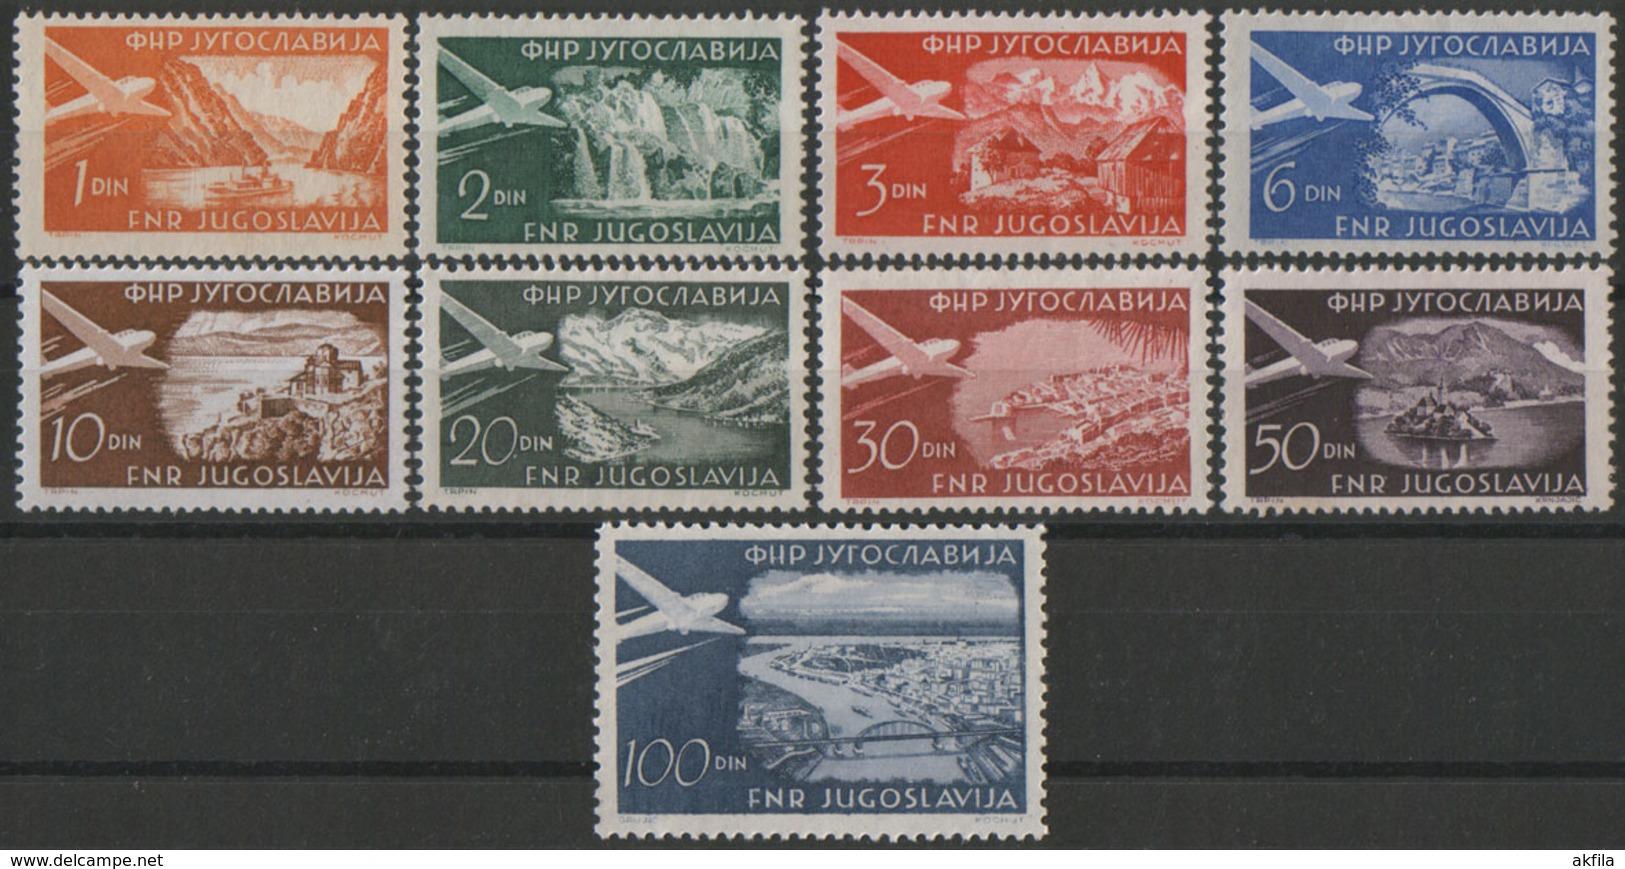 Yugoslavia 1951 Definitive - Airmail, MNH (**) Michel 644-652 - 1945-1992 Socialist Federal Republic Of Yugoslavia